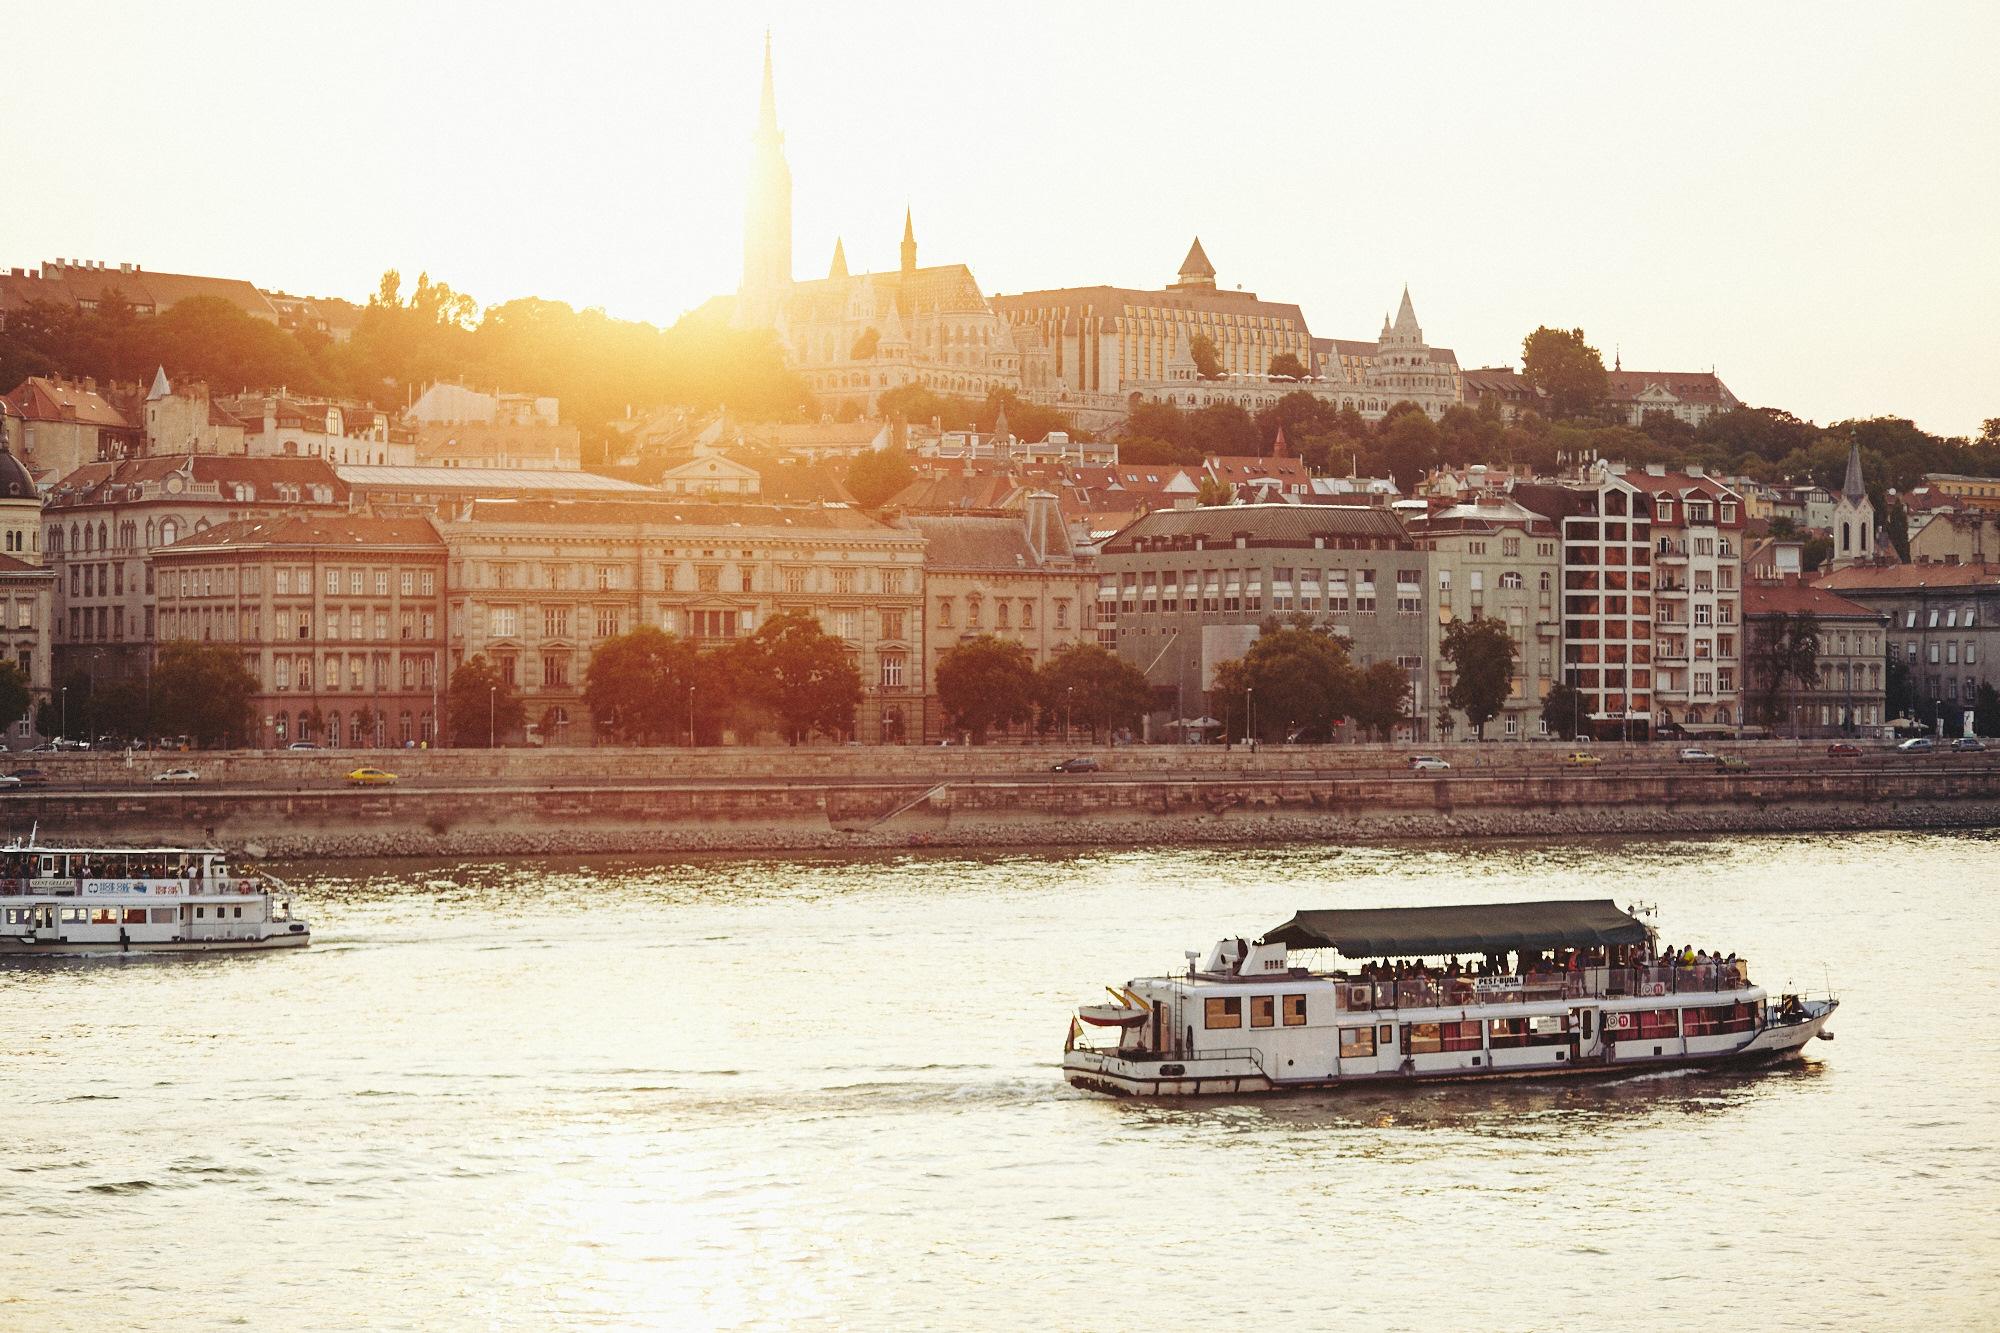 maxmotel_budapest_aug2015_day02_14_danube_bridge_1298